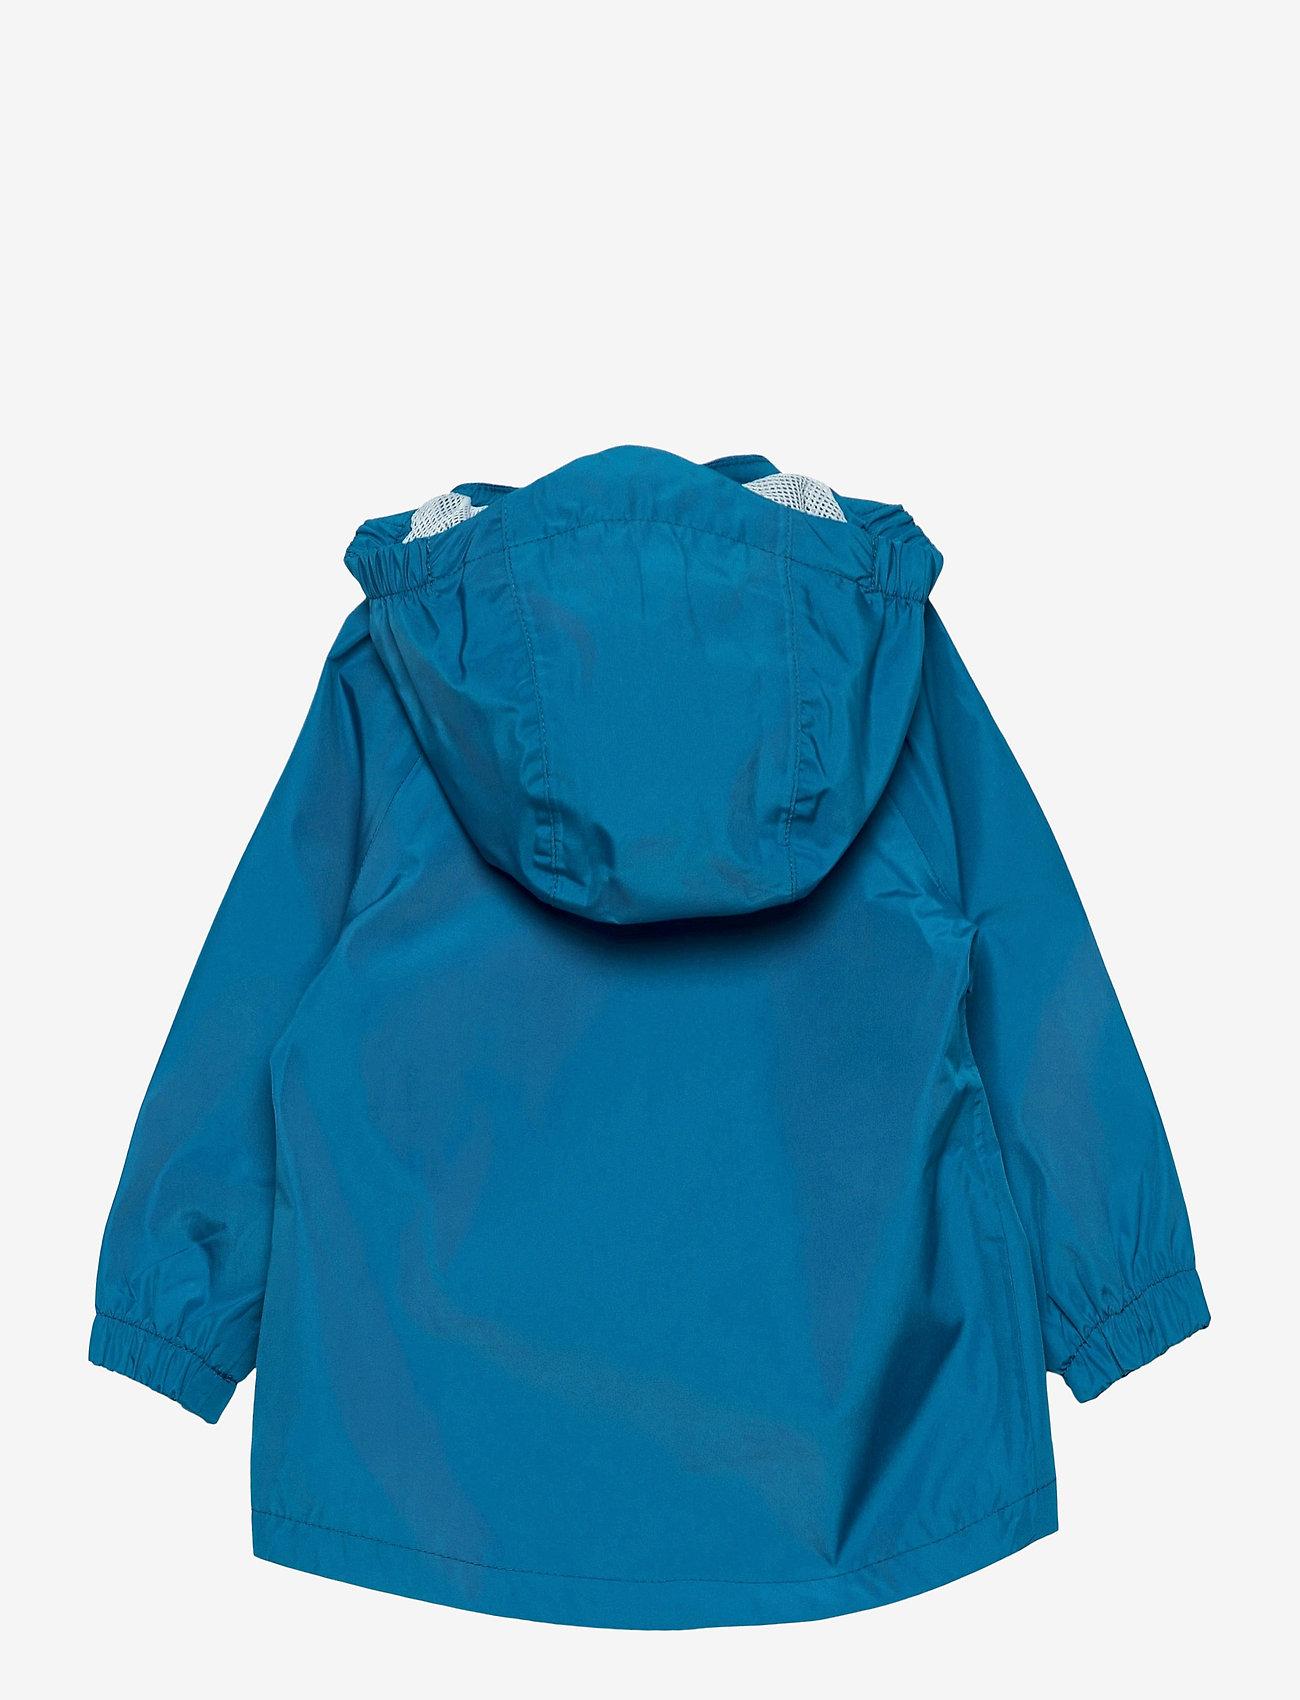 Hummel - hmlOJO JACKET - light jackets - mykonos blue - 1